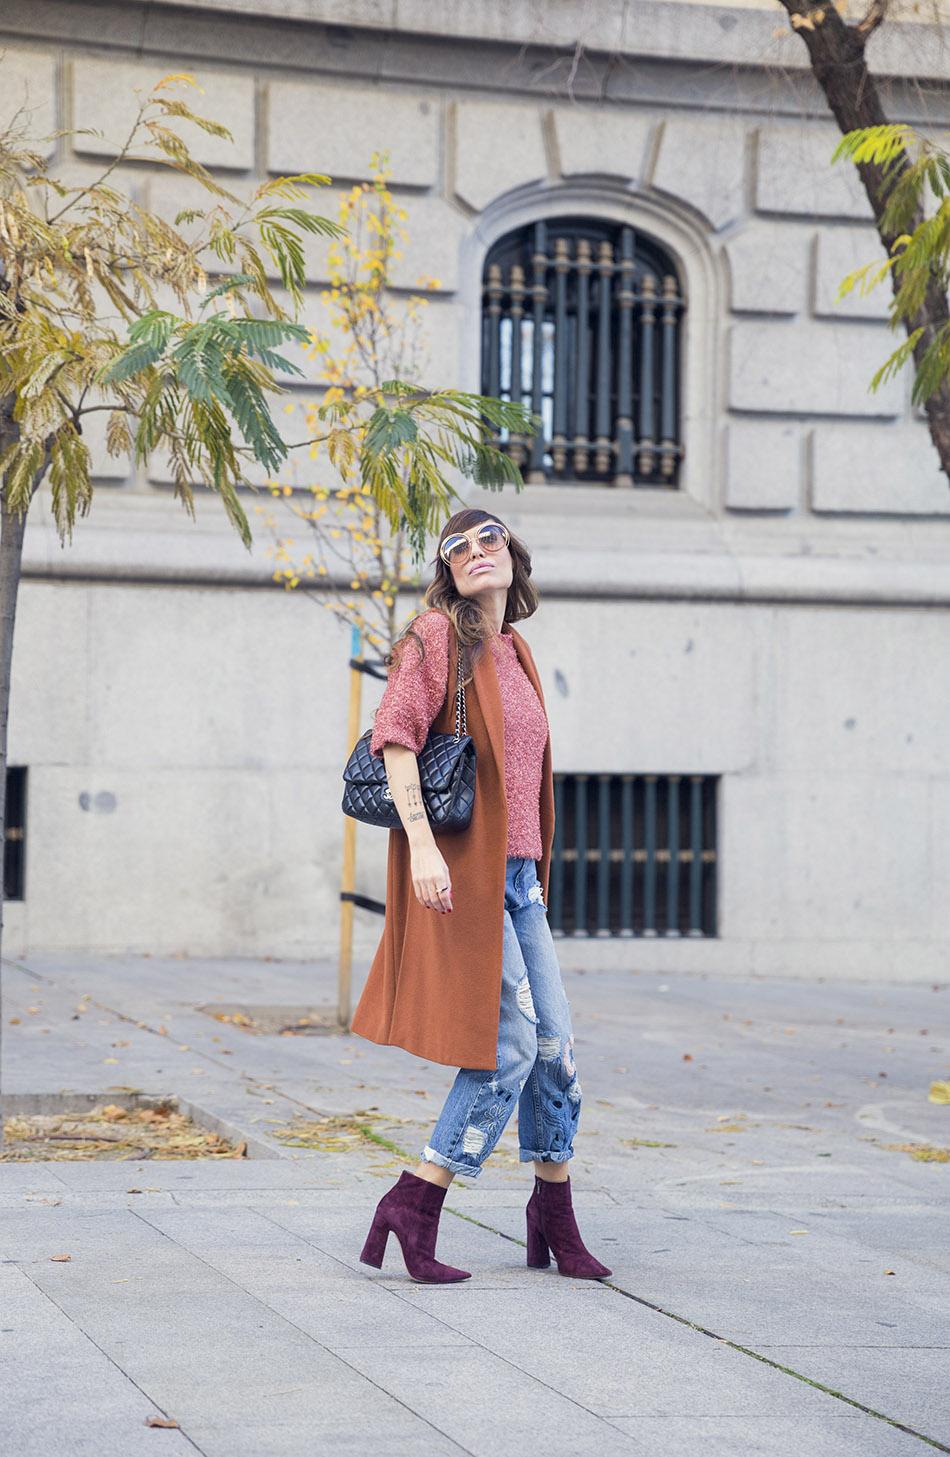 street-style-pura-lopez-boots-chloe-sunglasses-denim-jeans-03